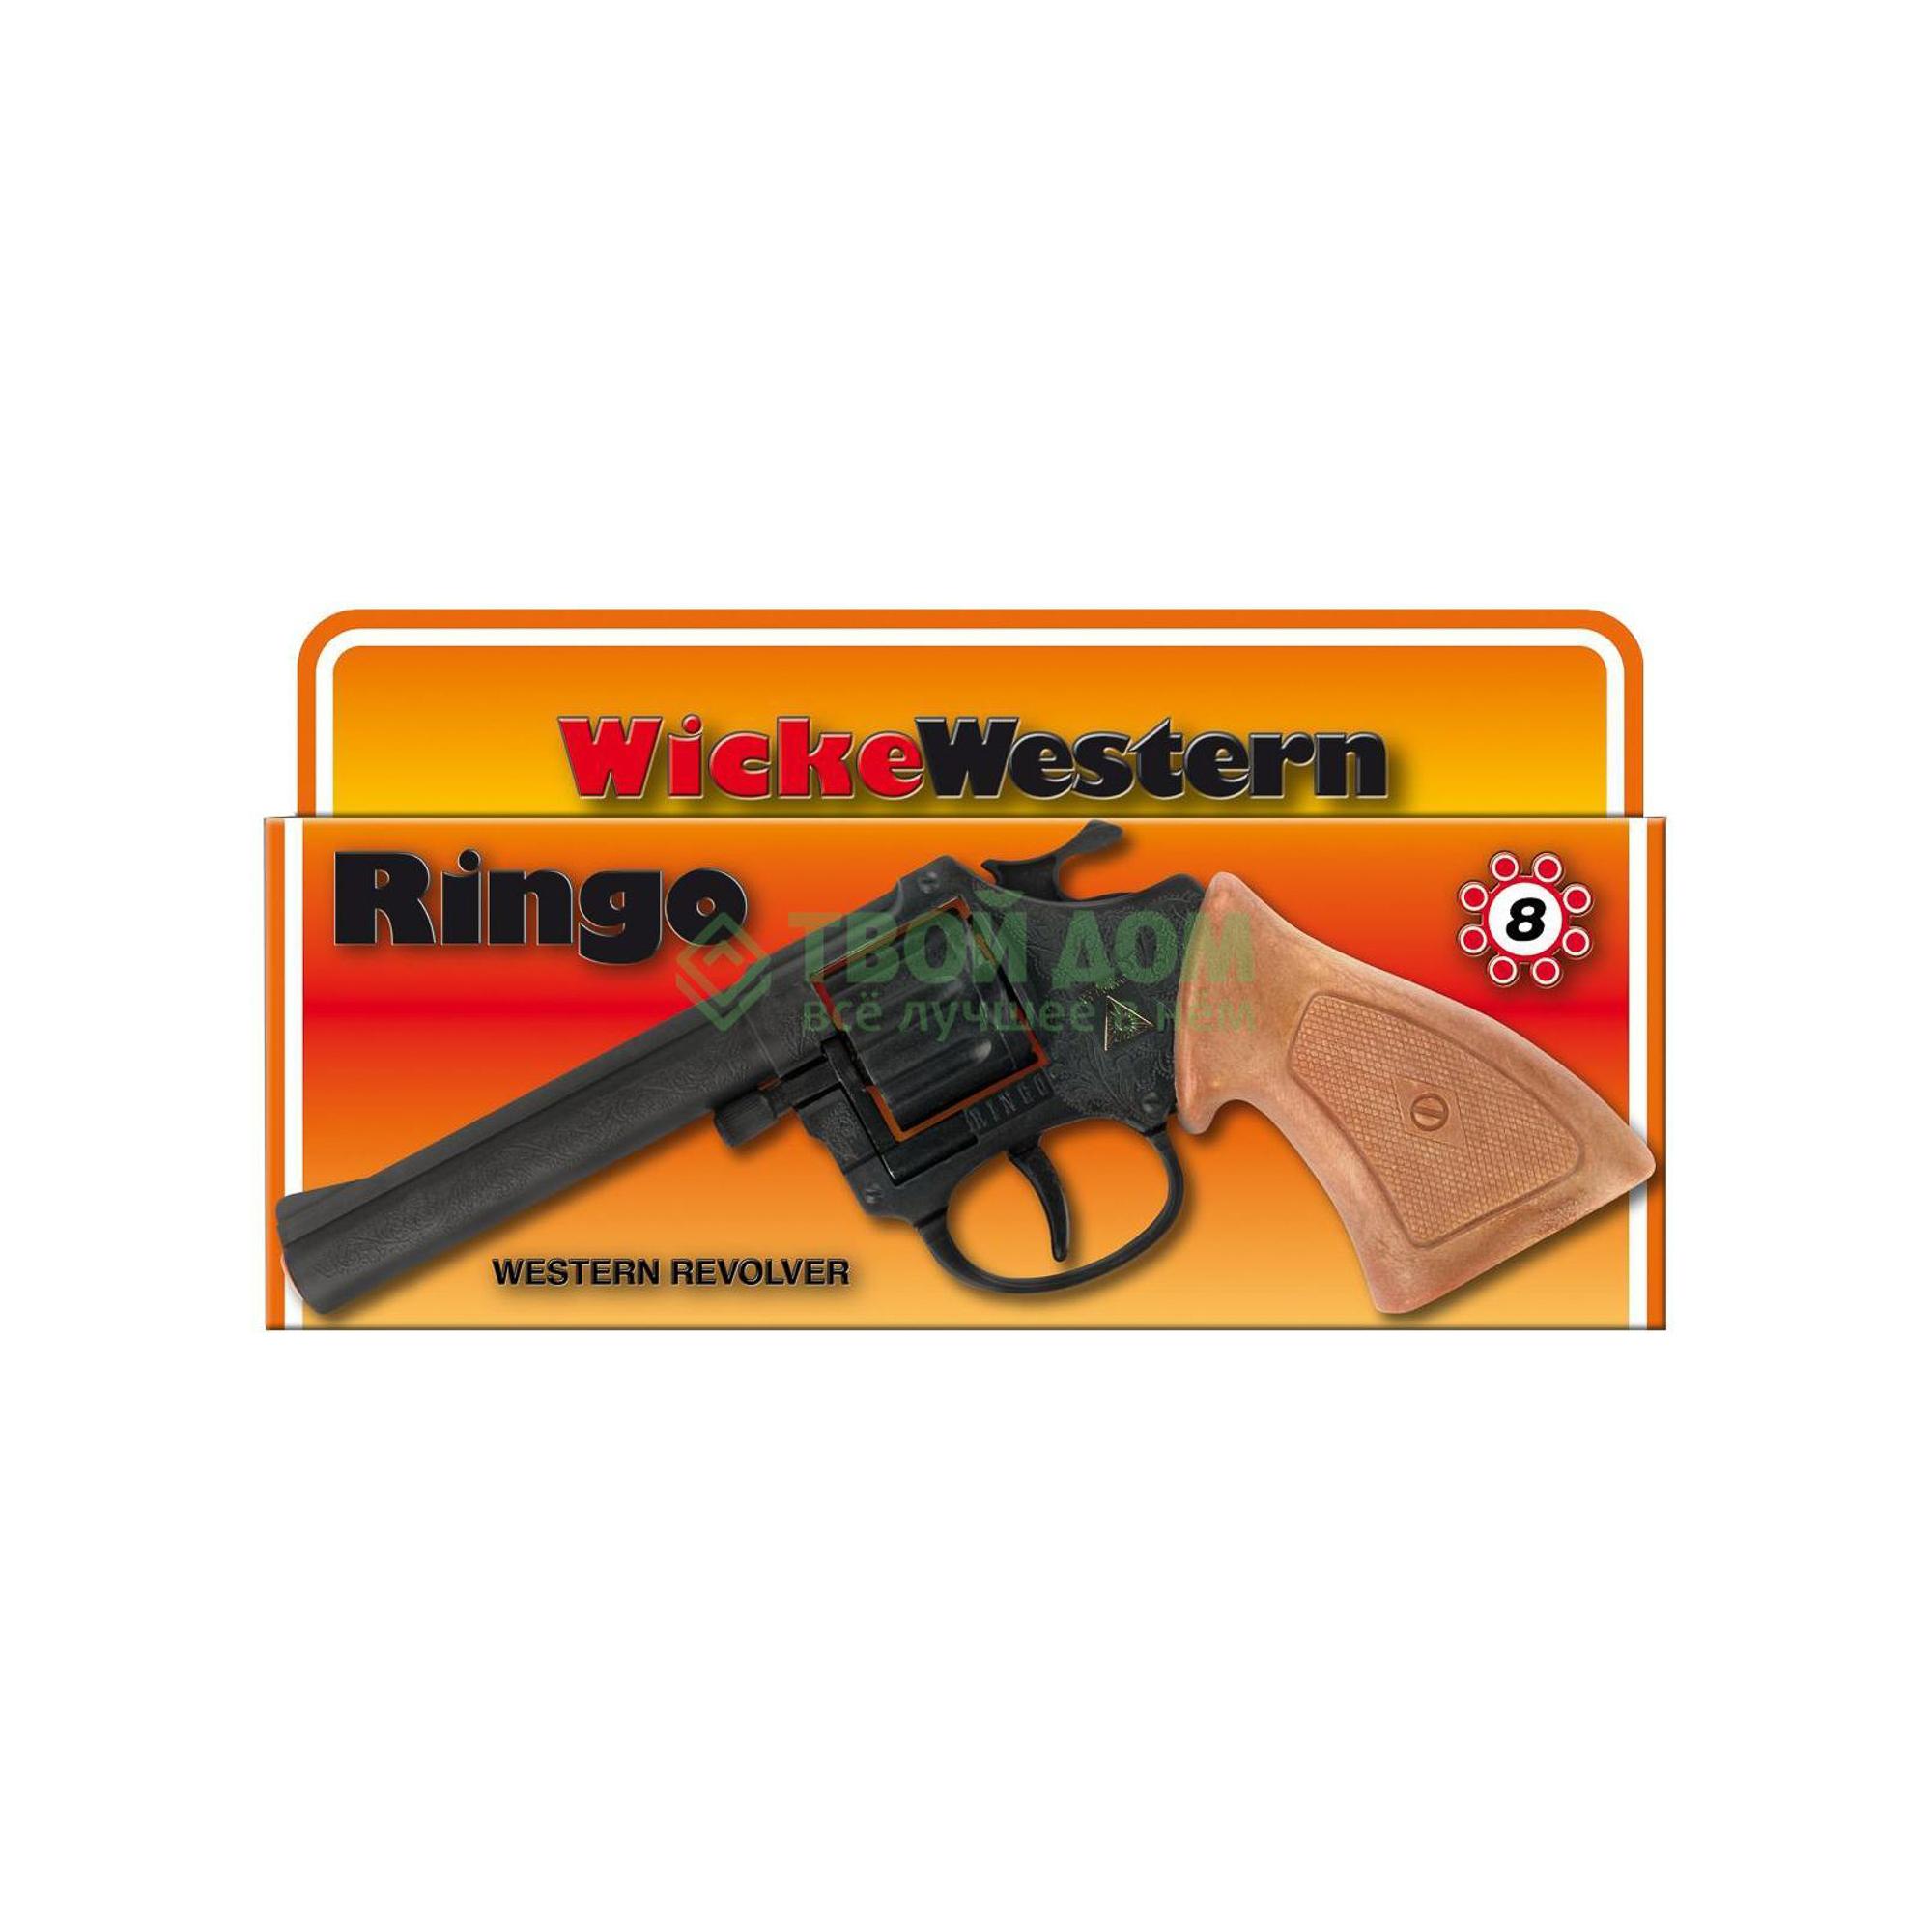 Бластер Sohni-wicke Пистолет ringo 8-зарядные gun